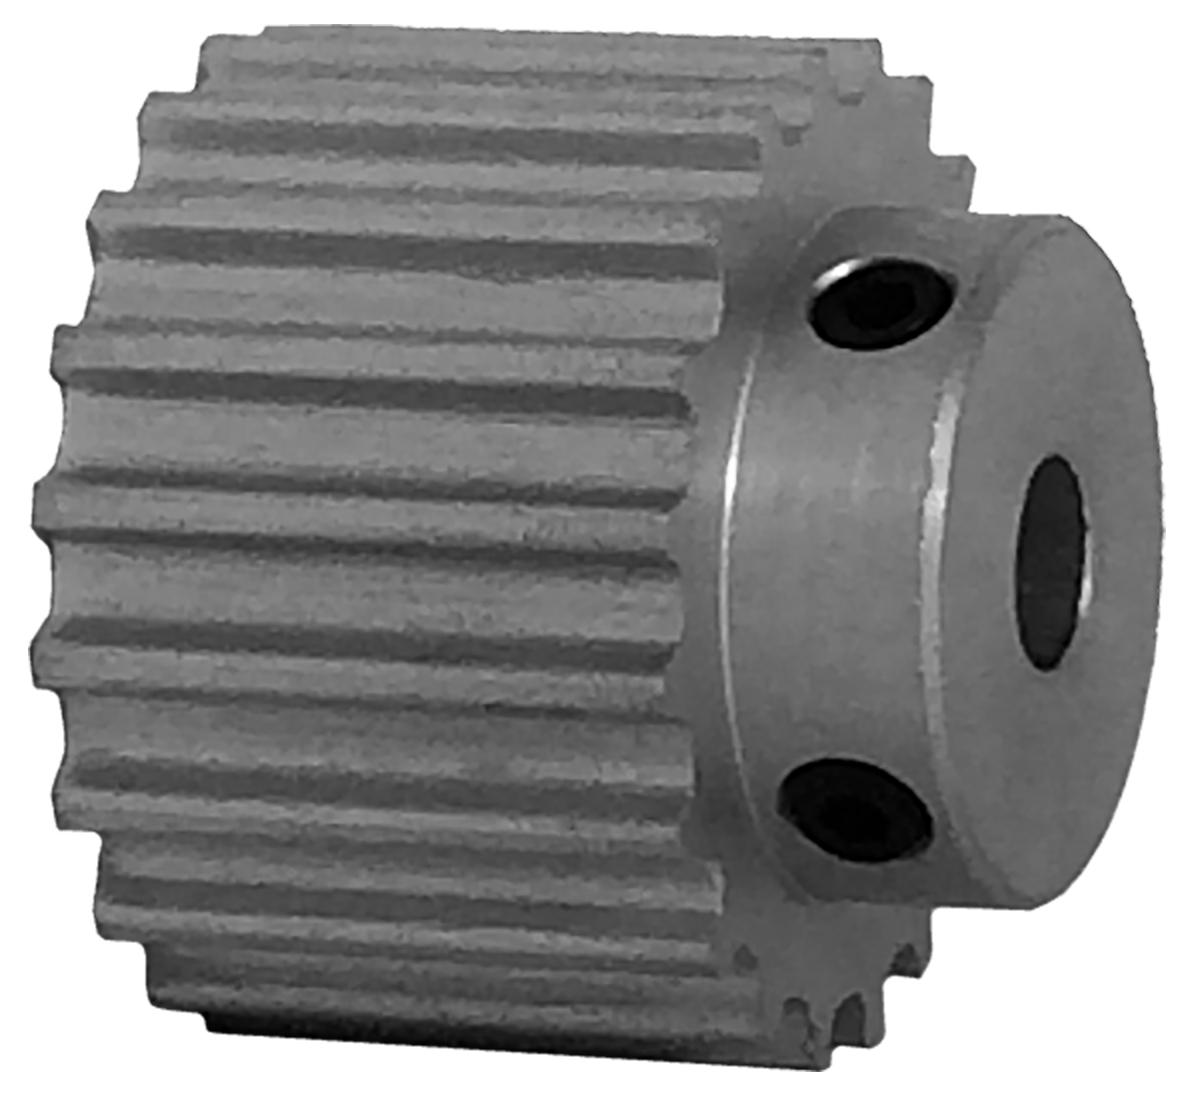 20-5M15-6A3 - Aluminum Powerhouse®HTD® Pulleys